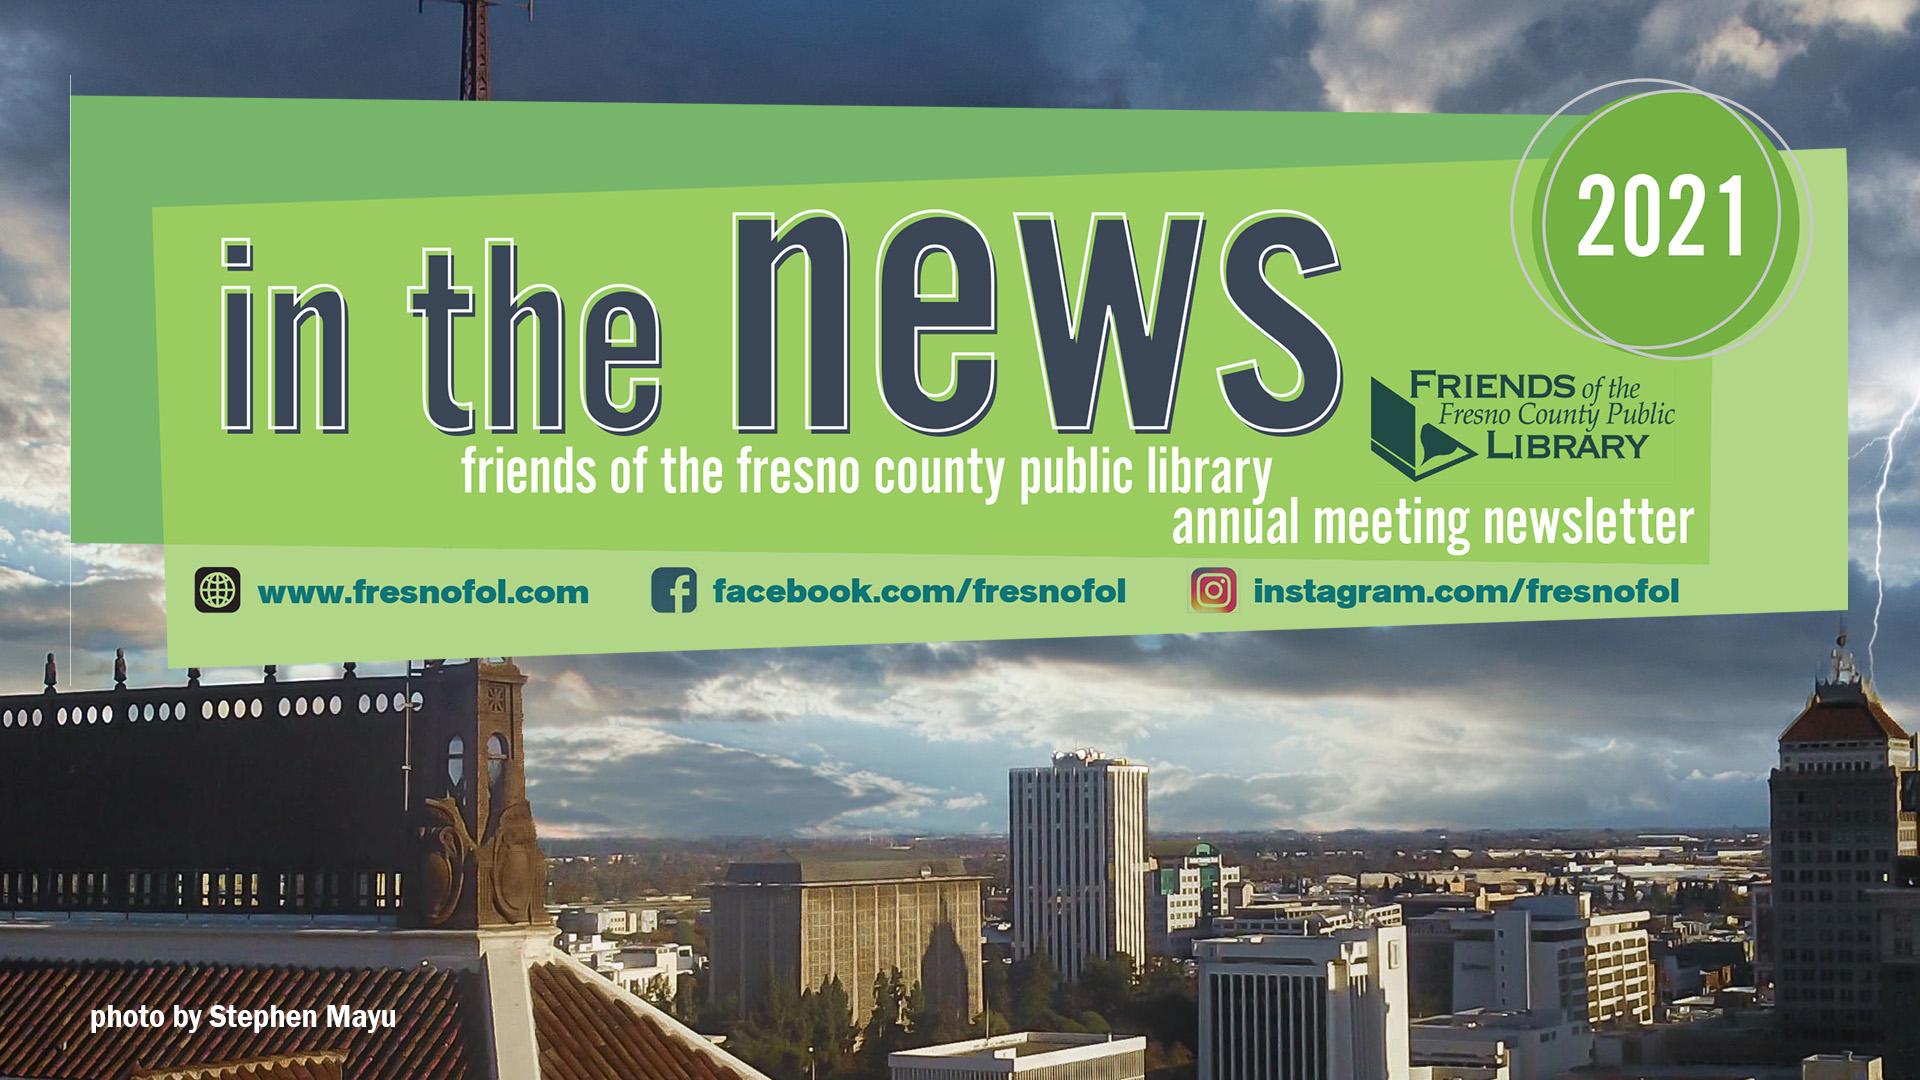 Fresno FOL Annual Meeting Newsletter, 2021